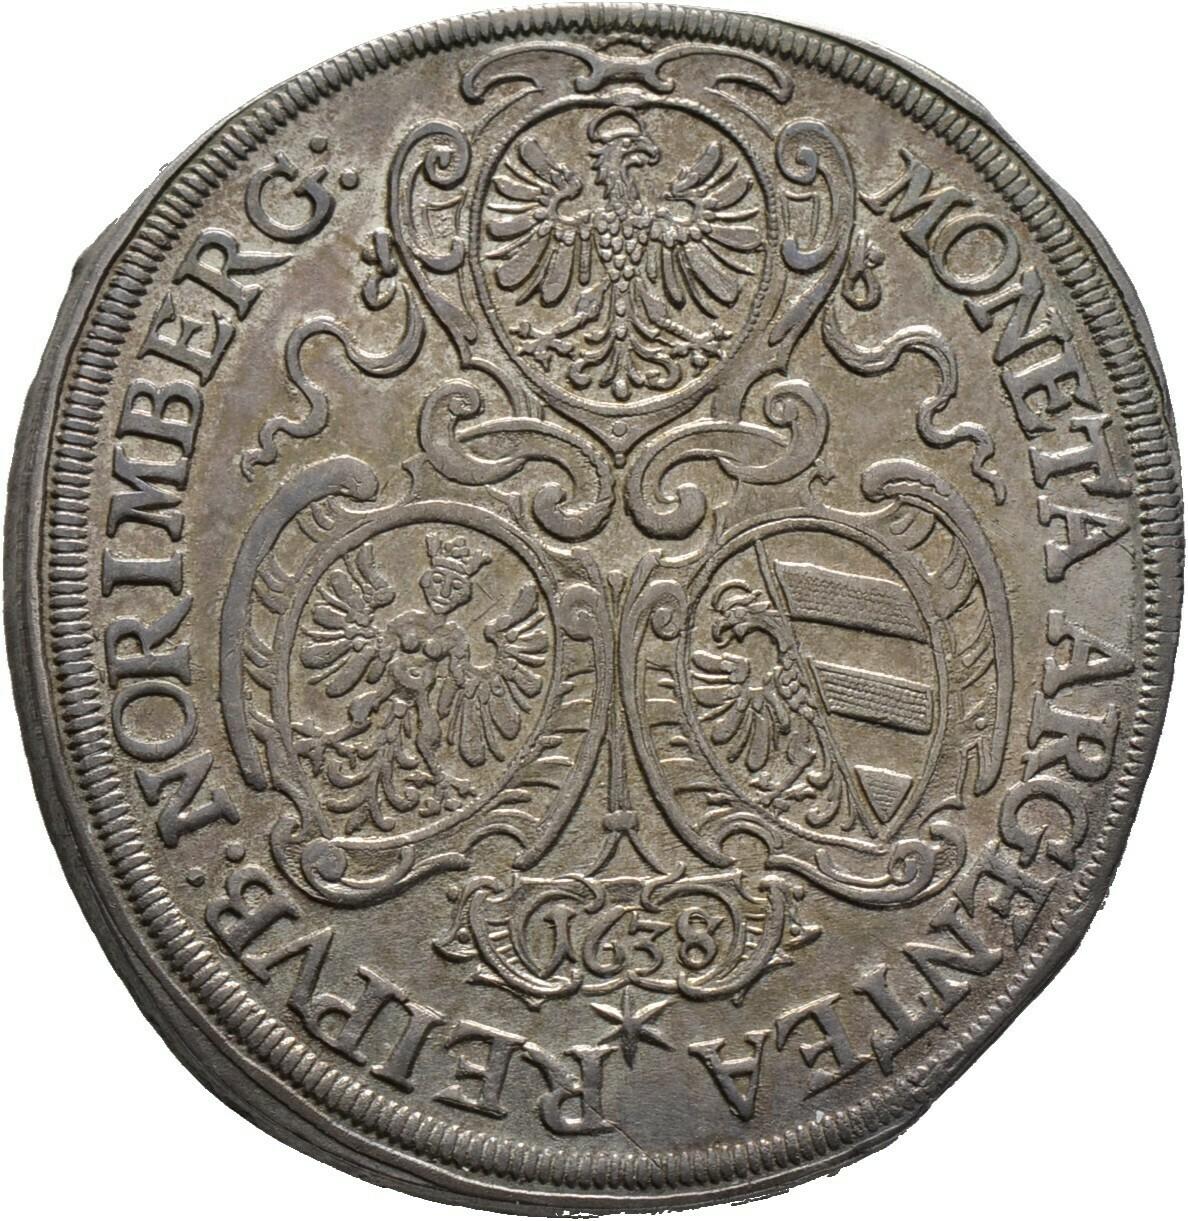 Taler 1638 (im Stempel aus 1637 geändert), Nürnberg, Stadt